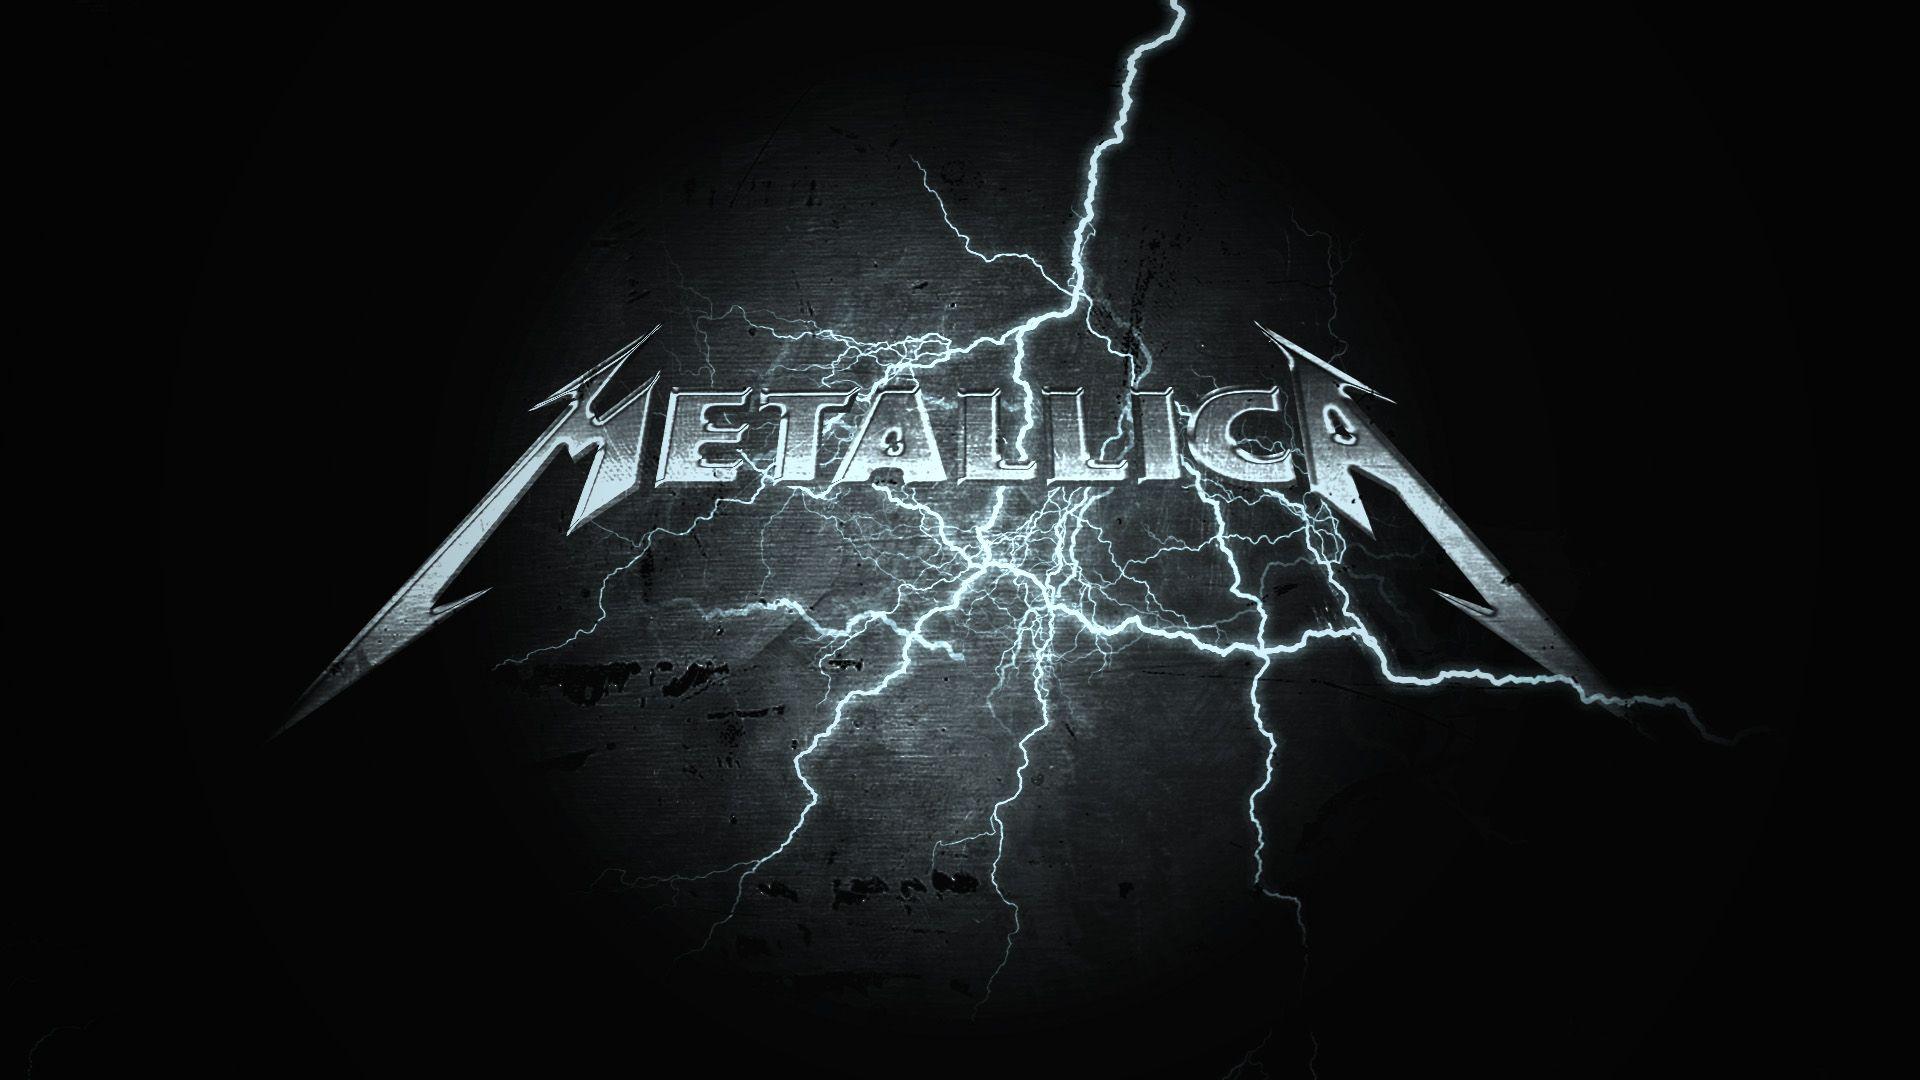 Metallica Wallpaper by VihKun on DeviantArt in 2020